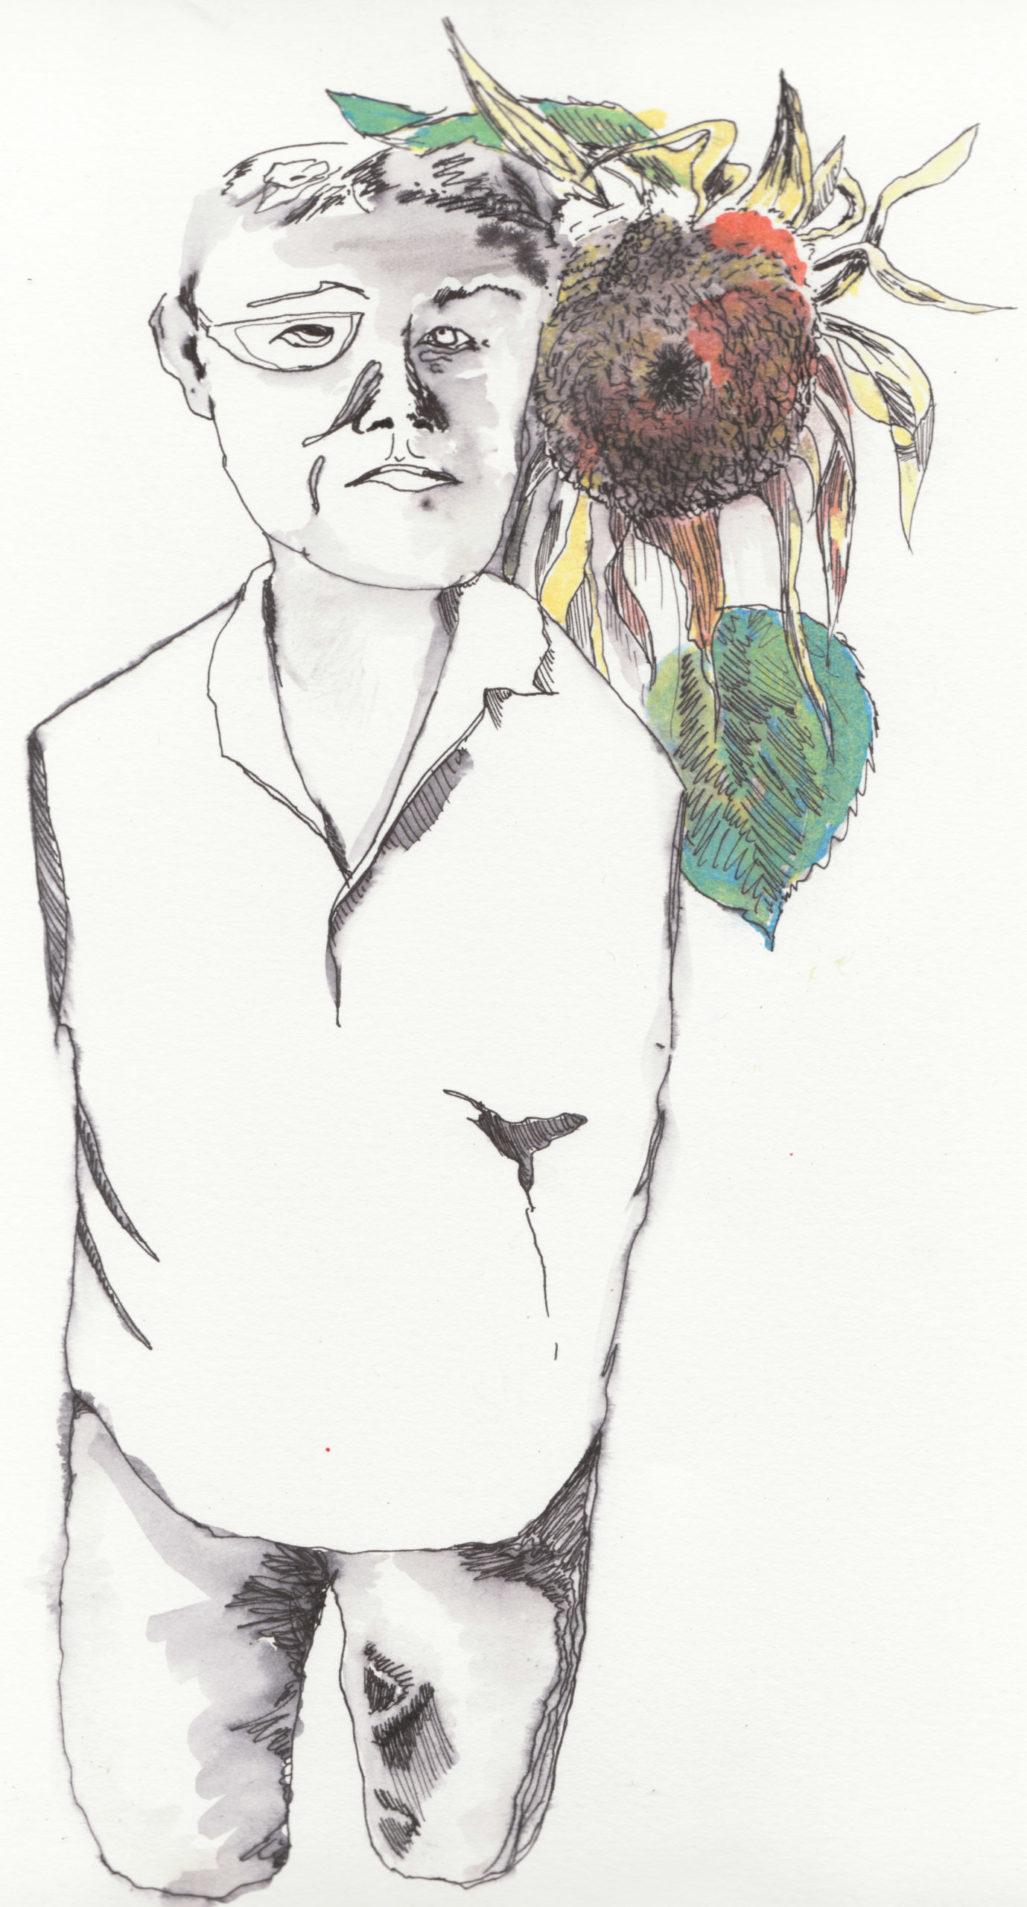 Illustration (c) by Mary Austin Fuller